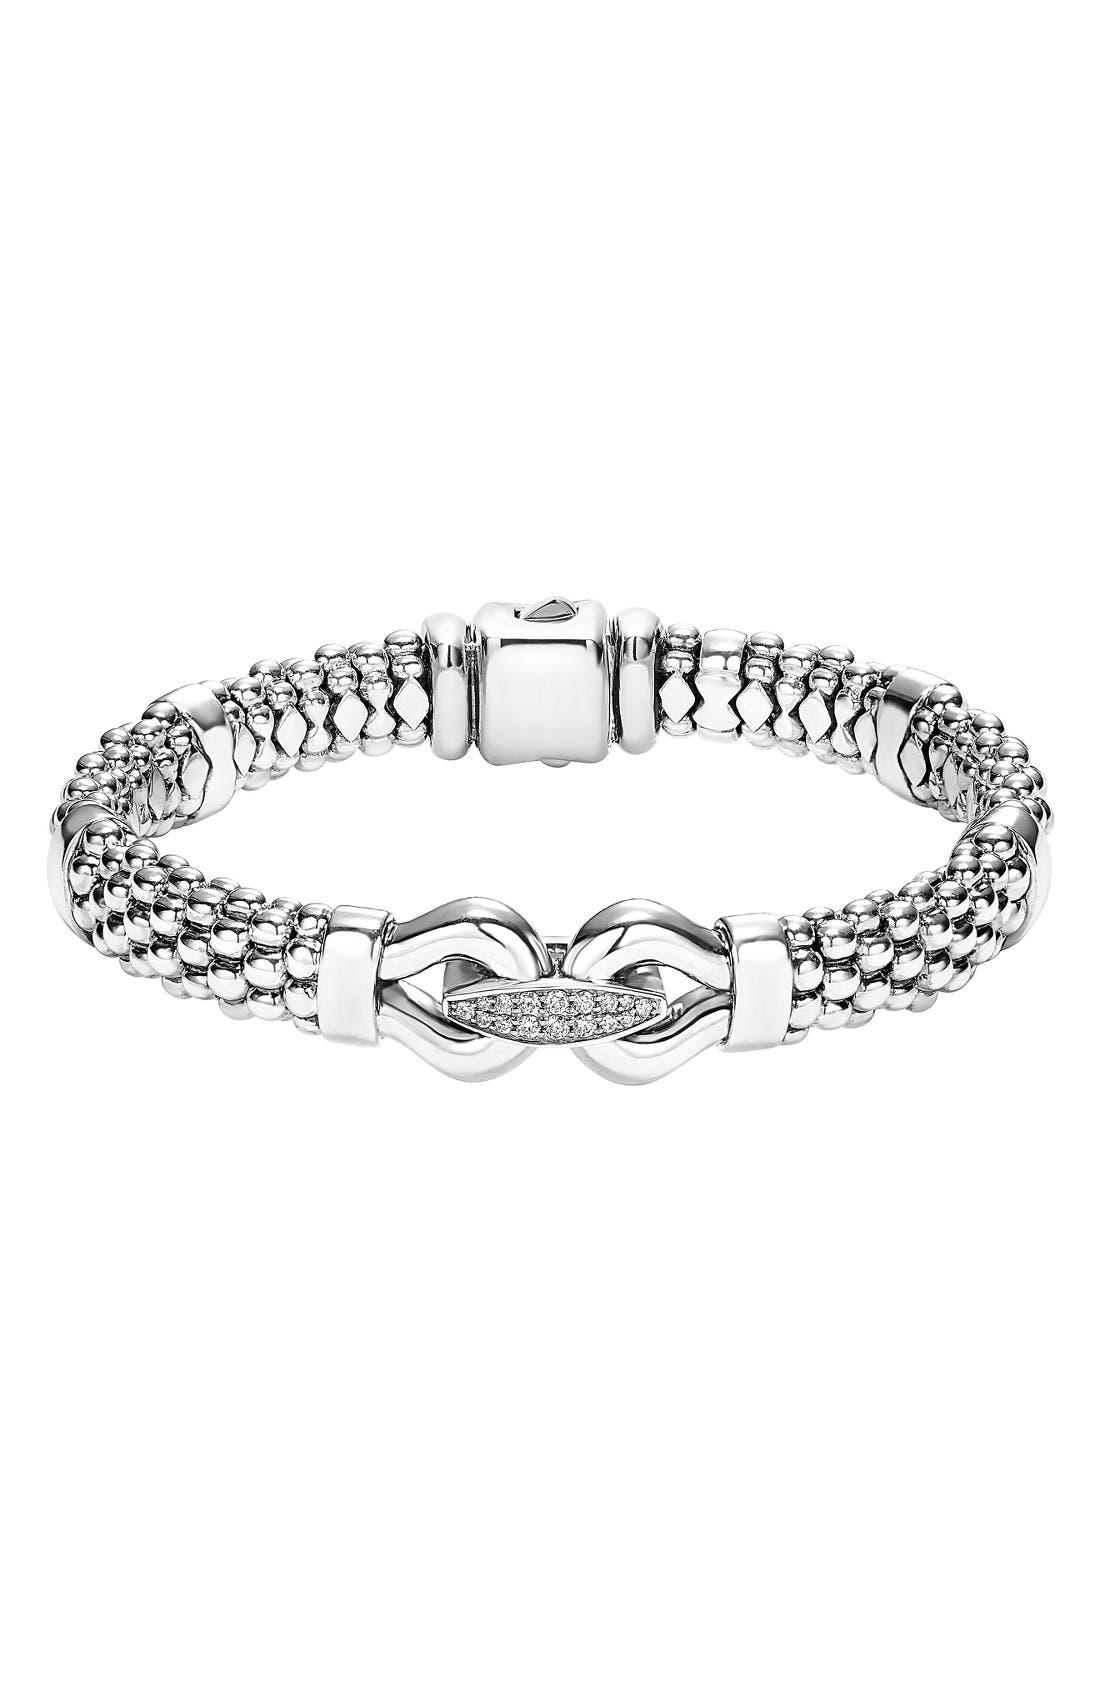 Main Image - LAGOS 'Derby' Diamond Buckle Rope Bracelet